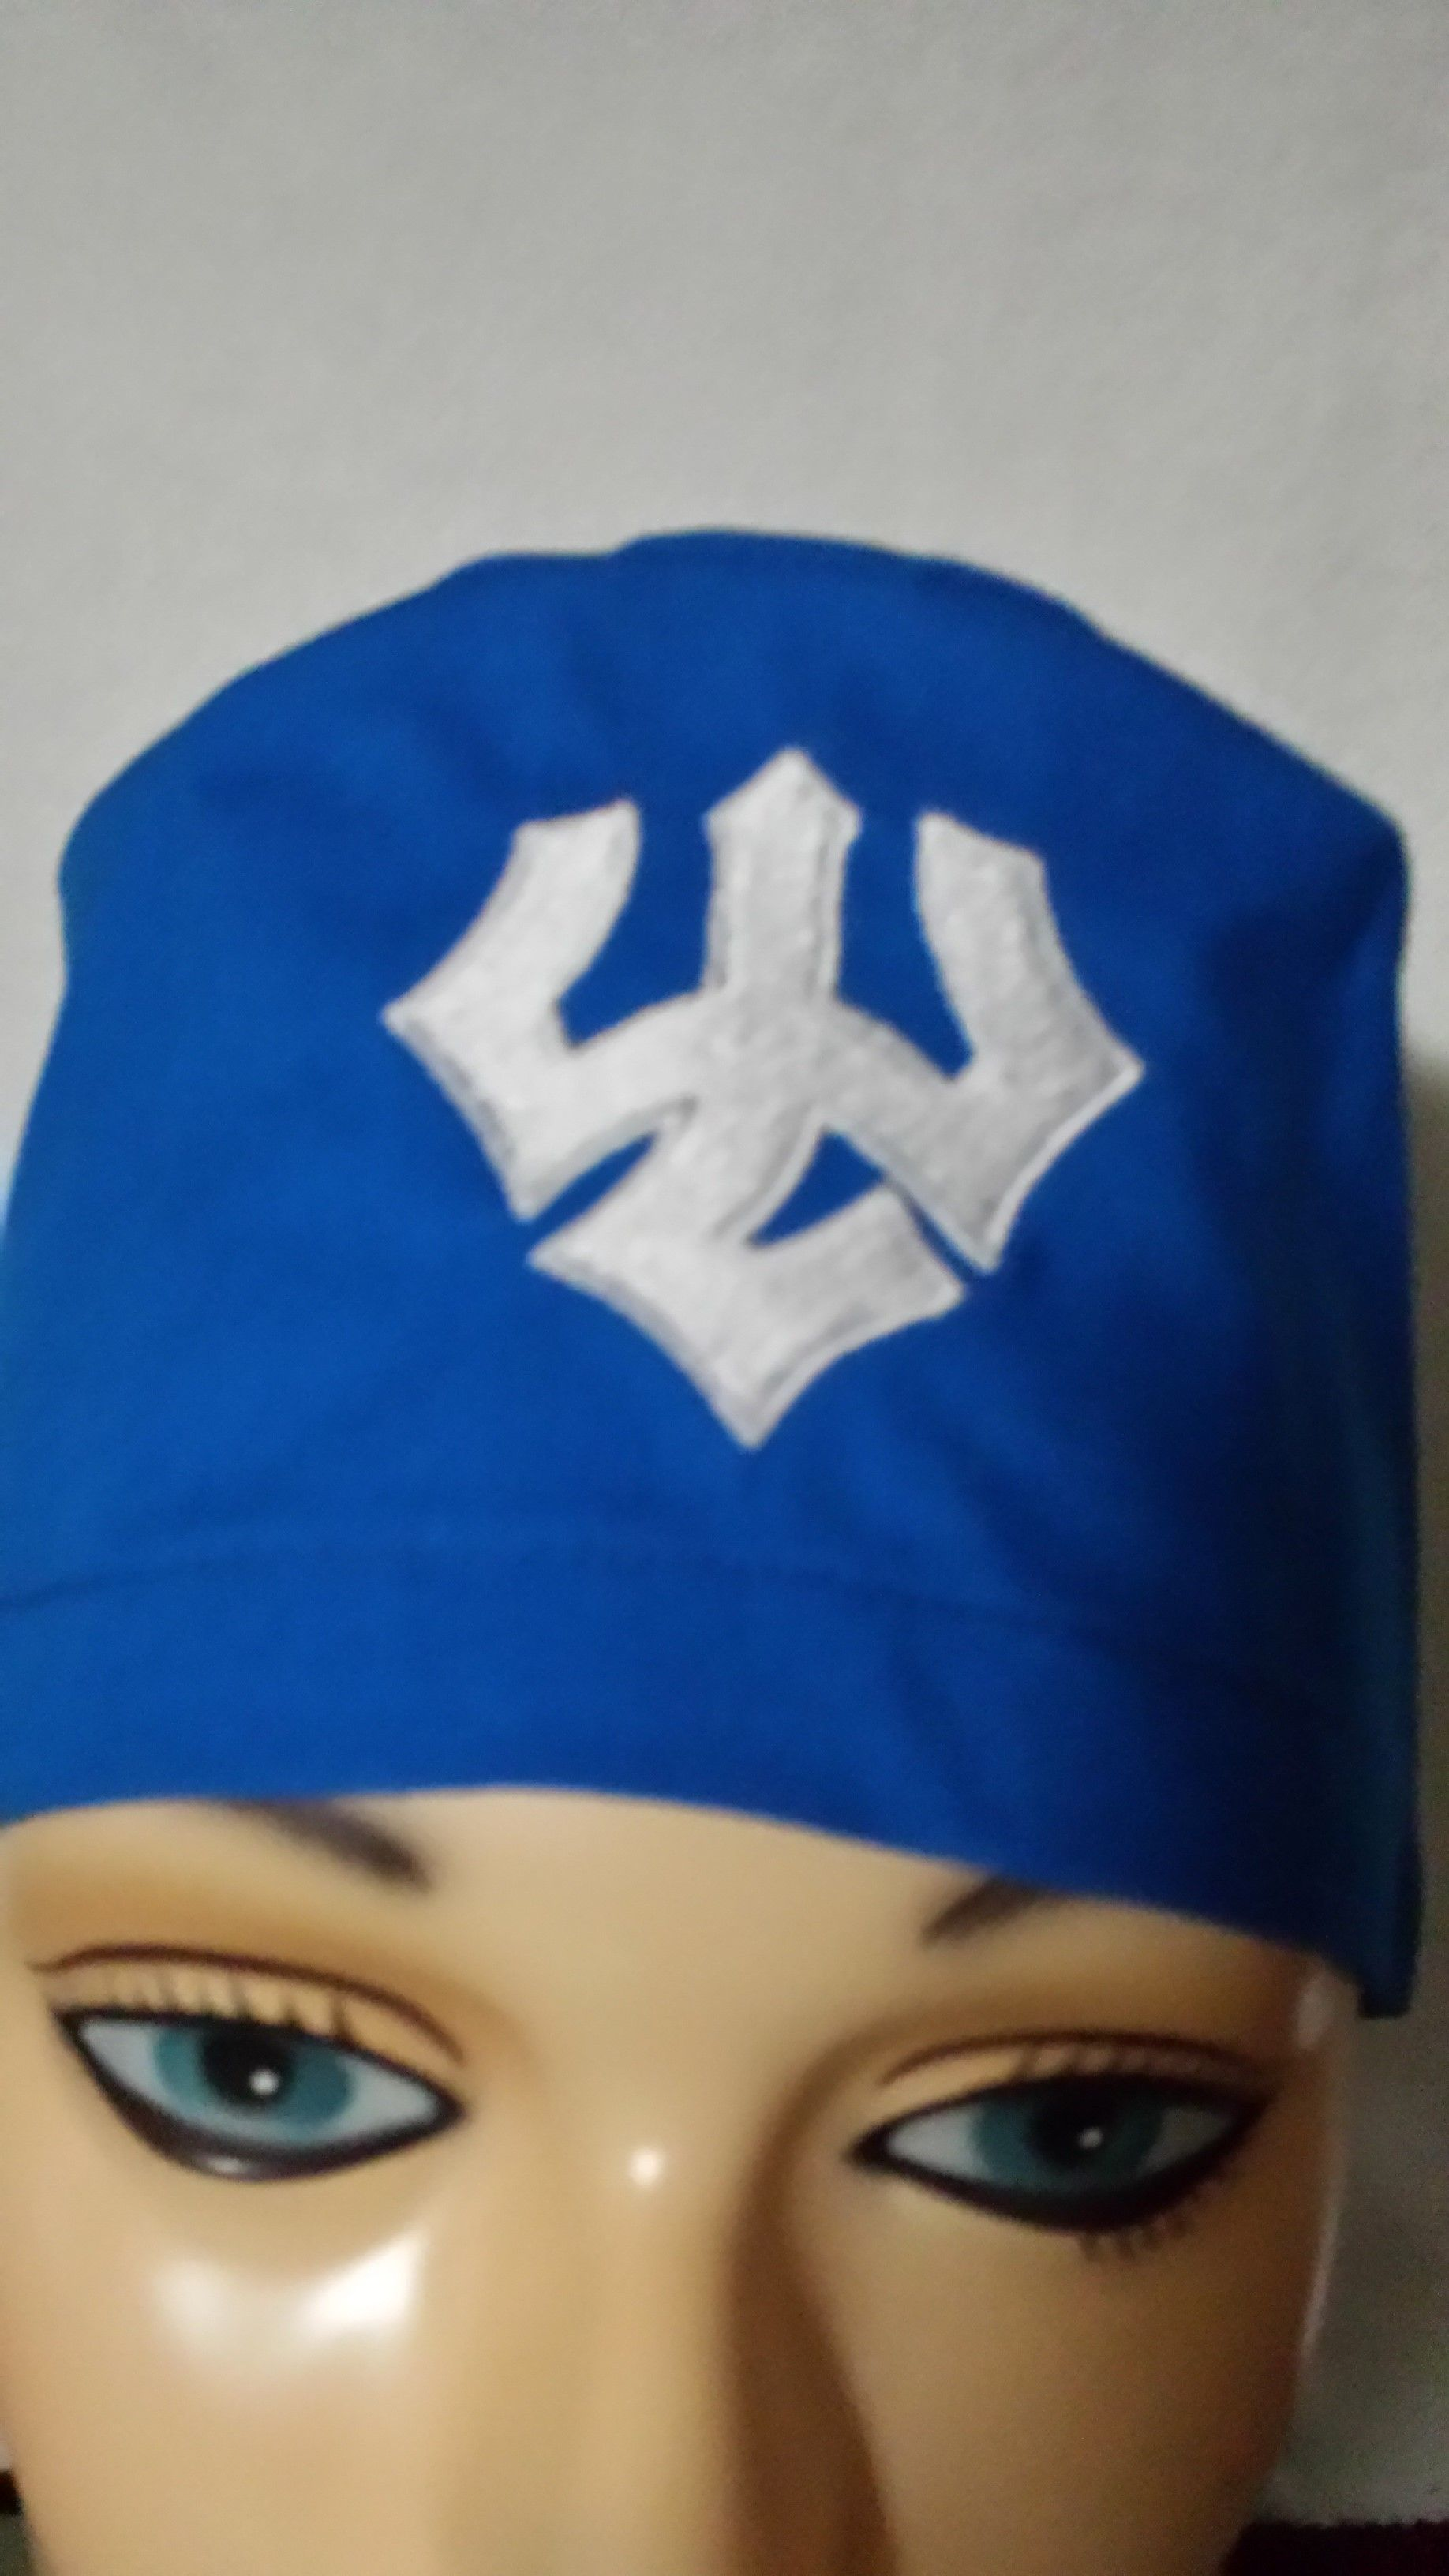 Washington and Lee logo embroidered on a male scrub cap